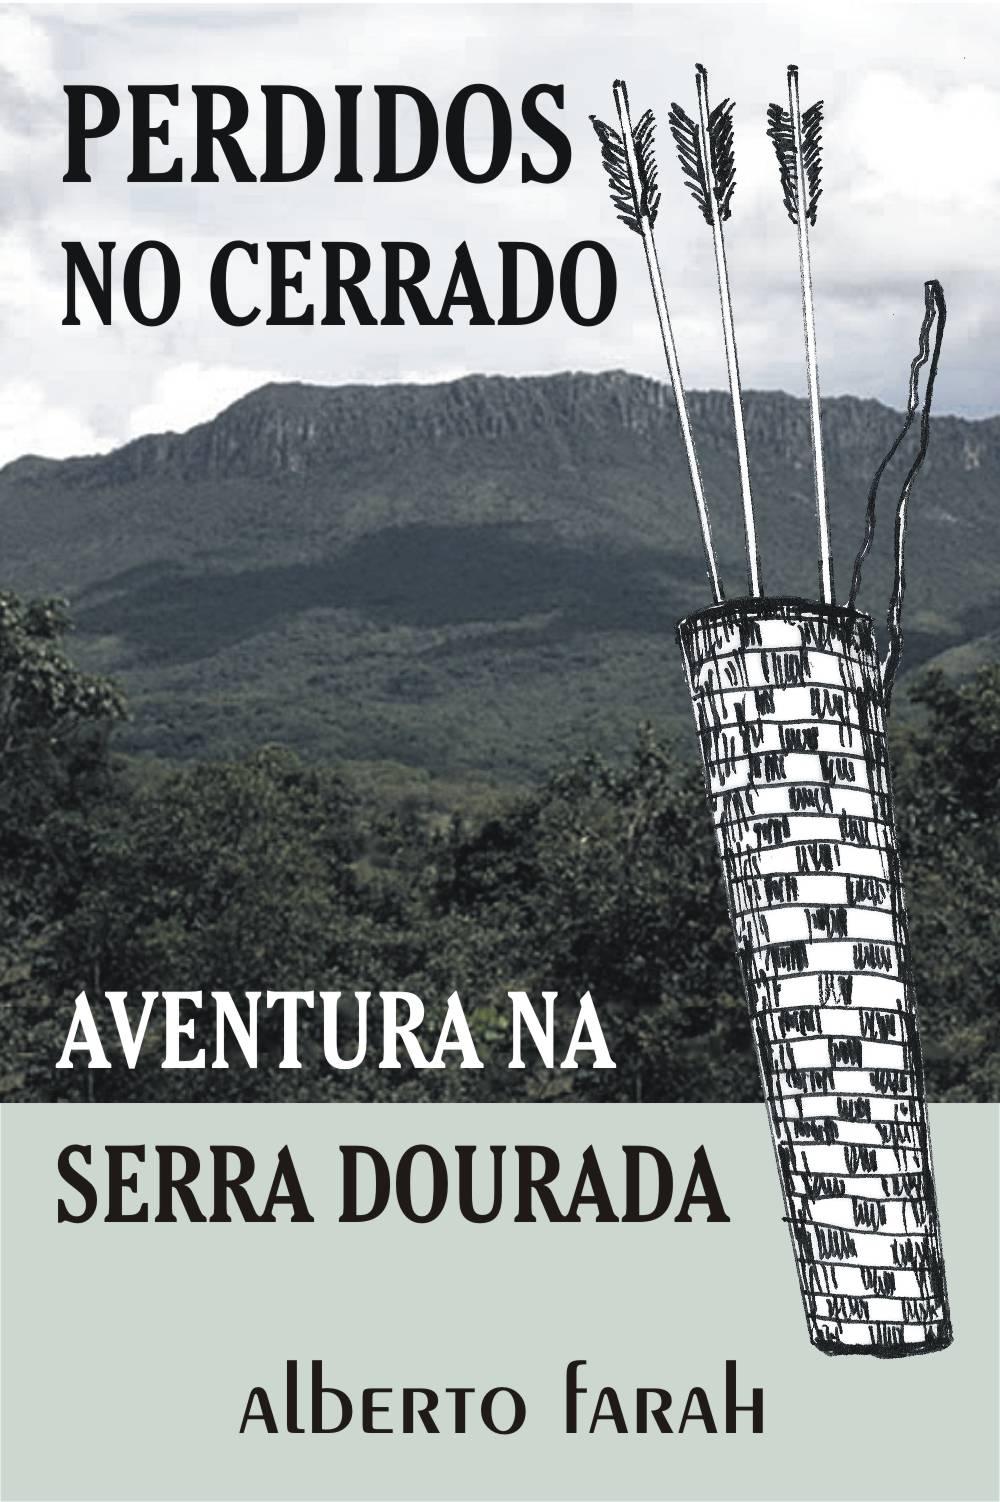 Livro - Perdidos no Cerrado - Aventura na Serra Dourada - Alberto Farah